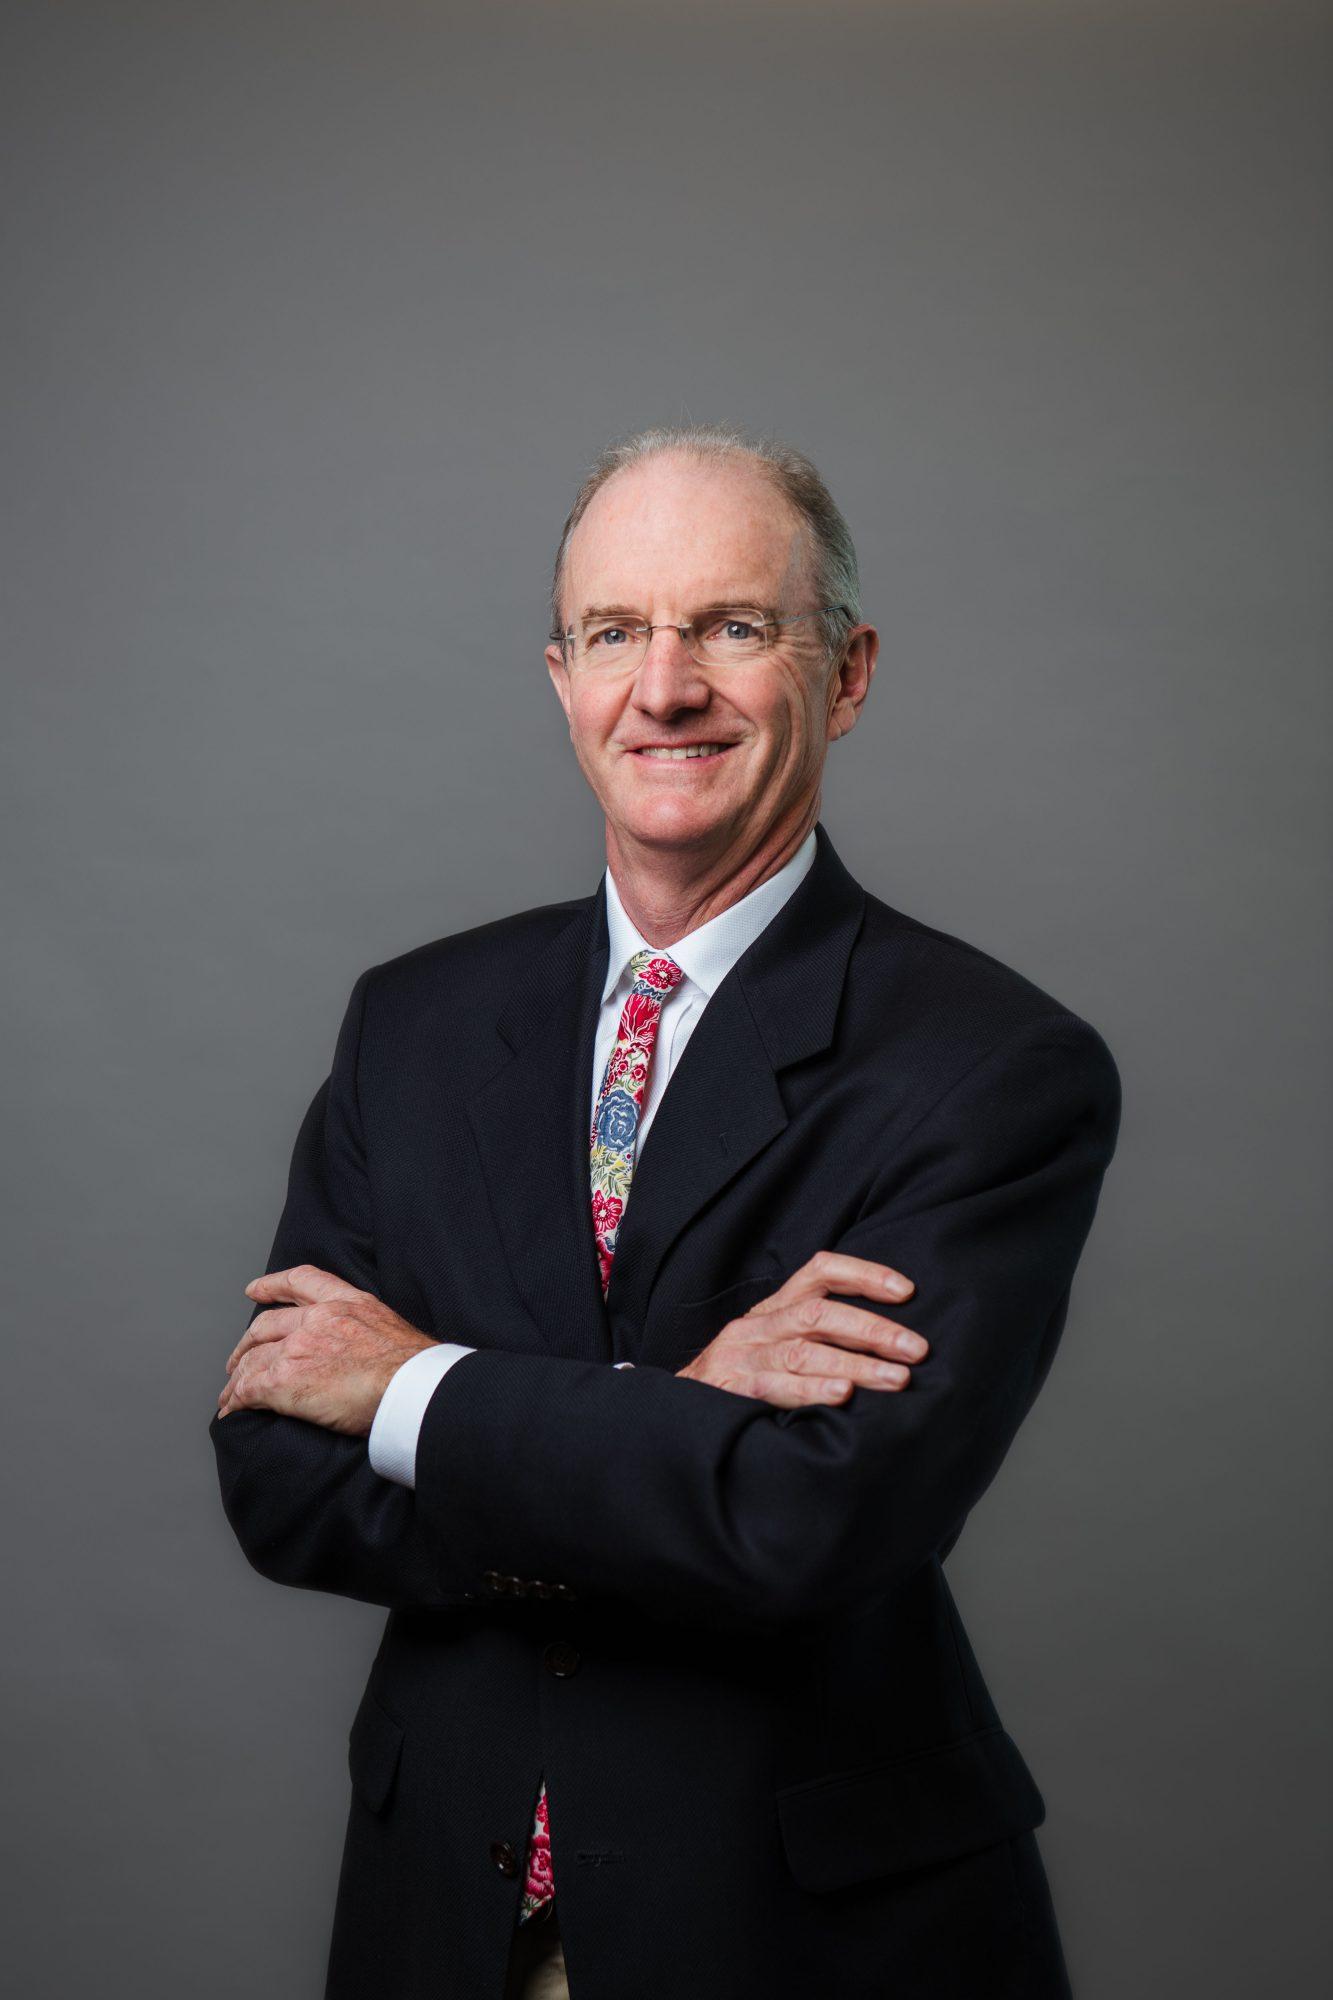 Photo of Robert FitzGibbons, MD